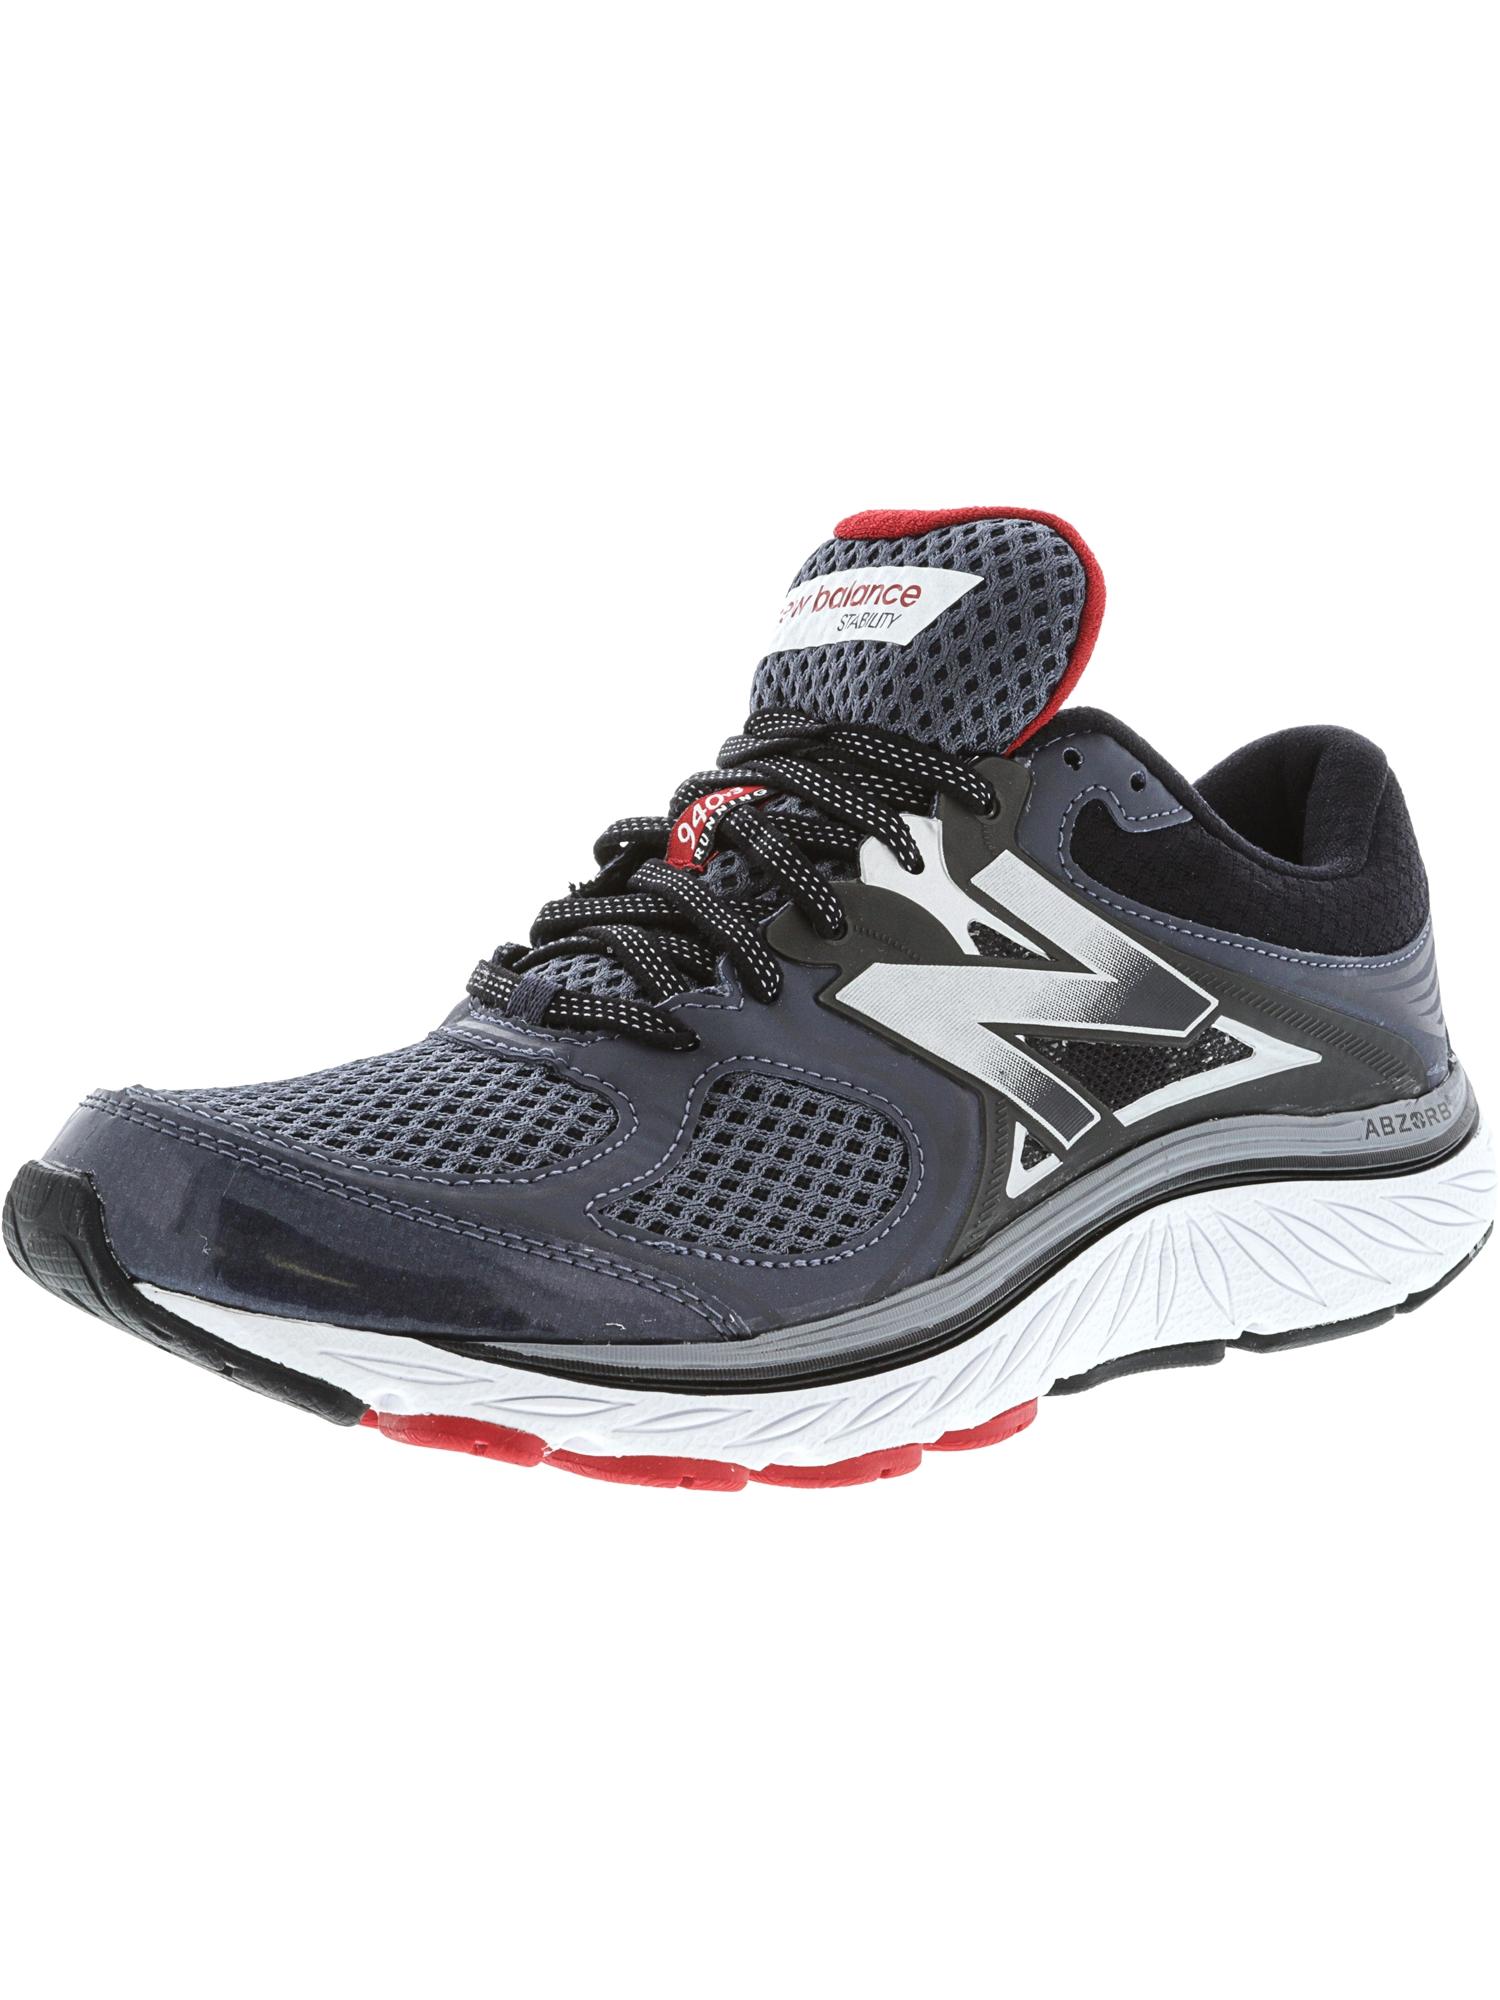 New Balance Men's M940 Br3 Ankle-High Running Shoe - 8M